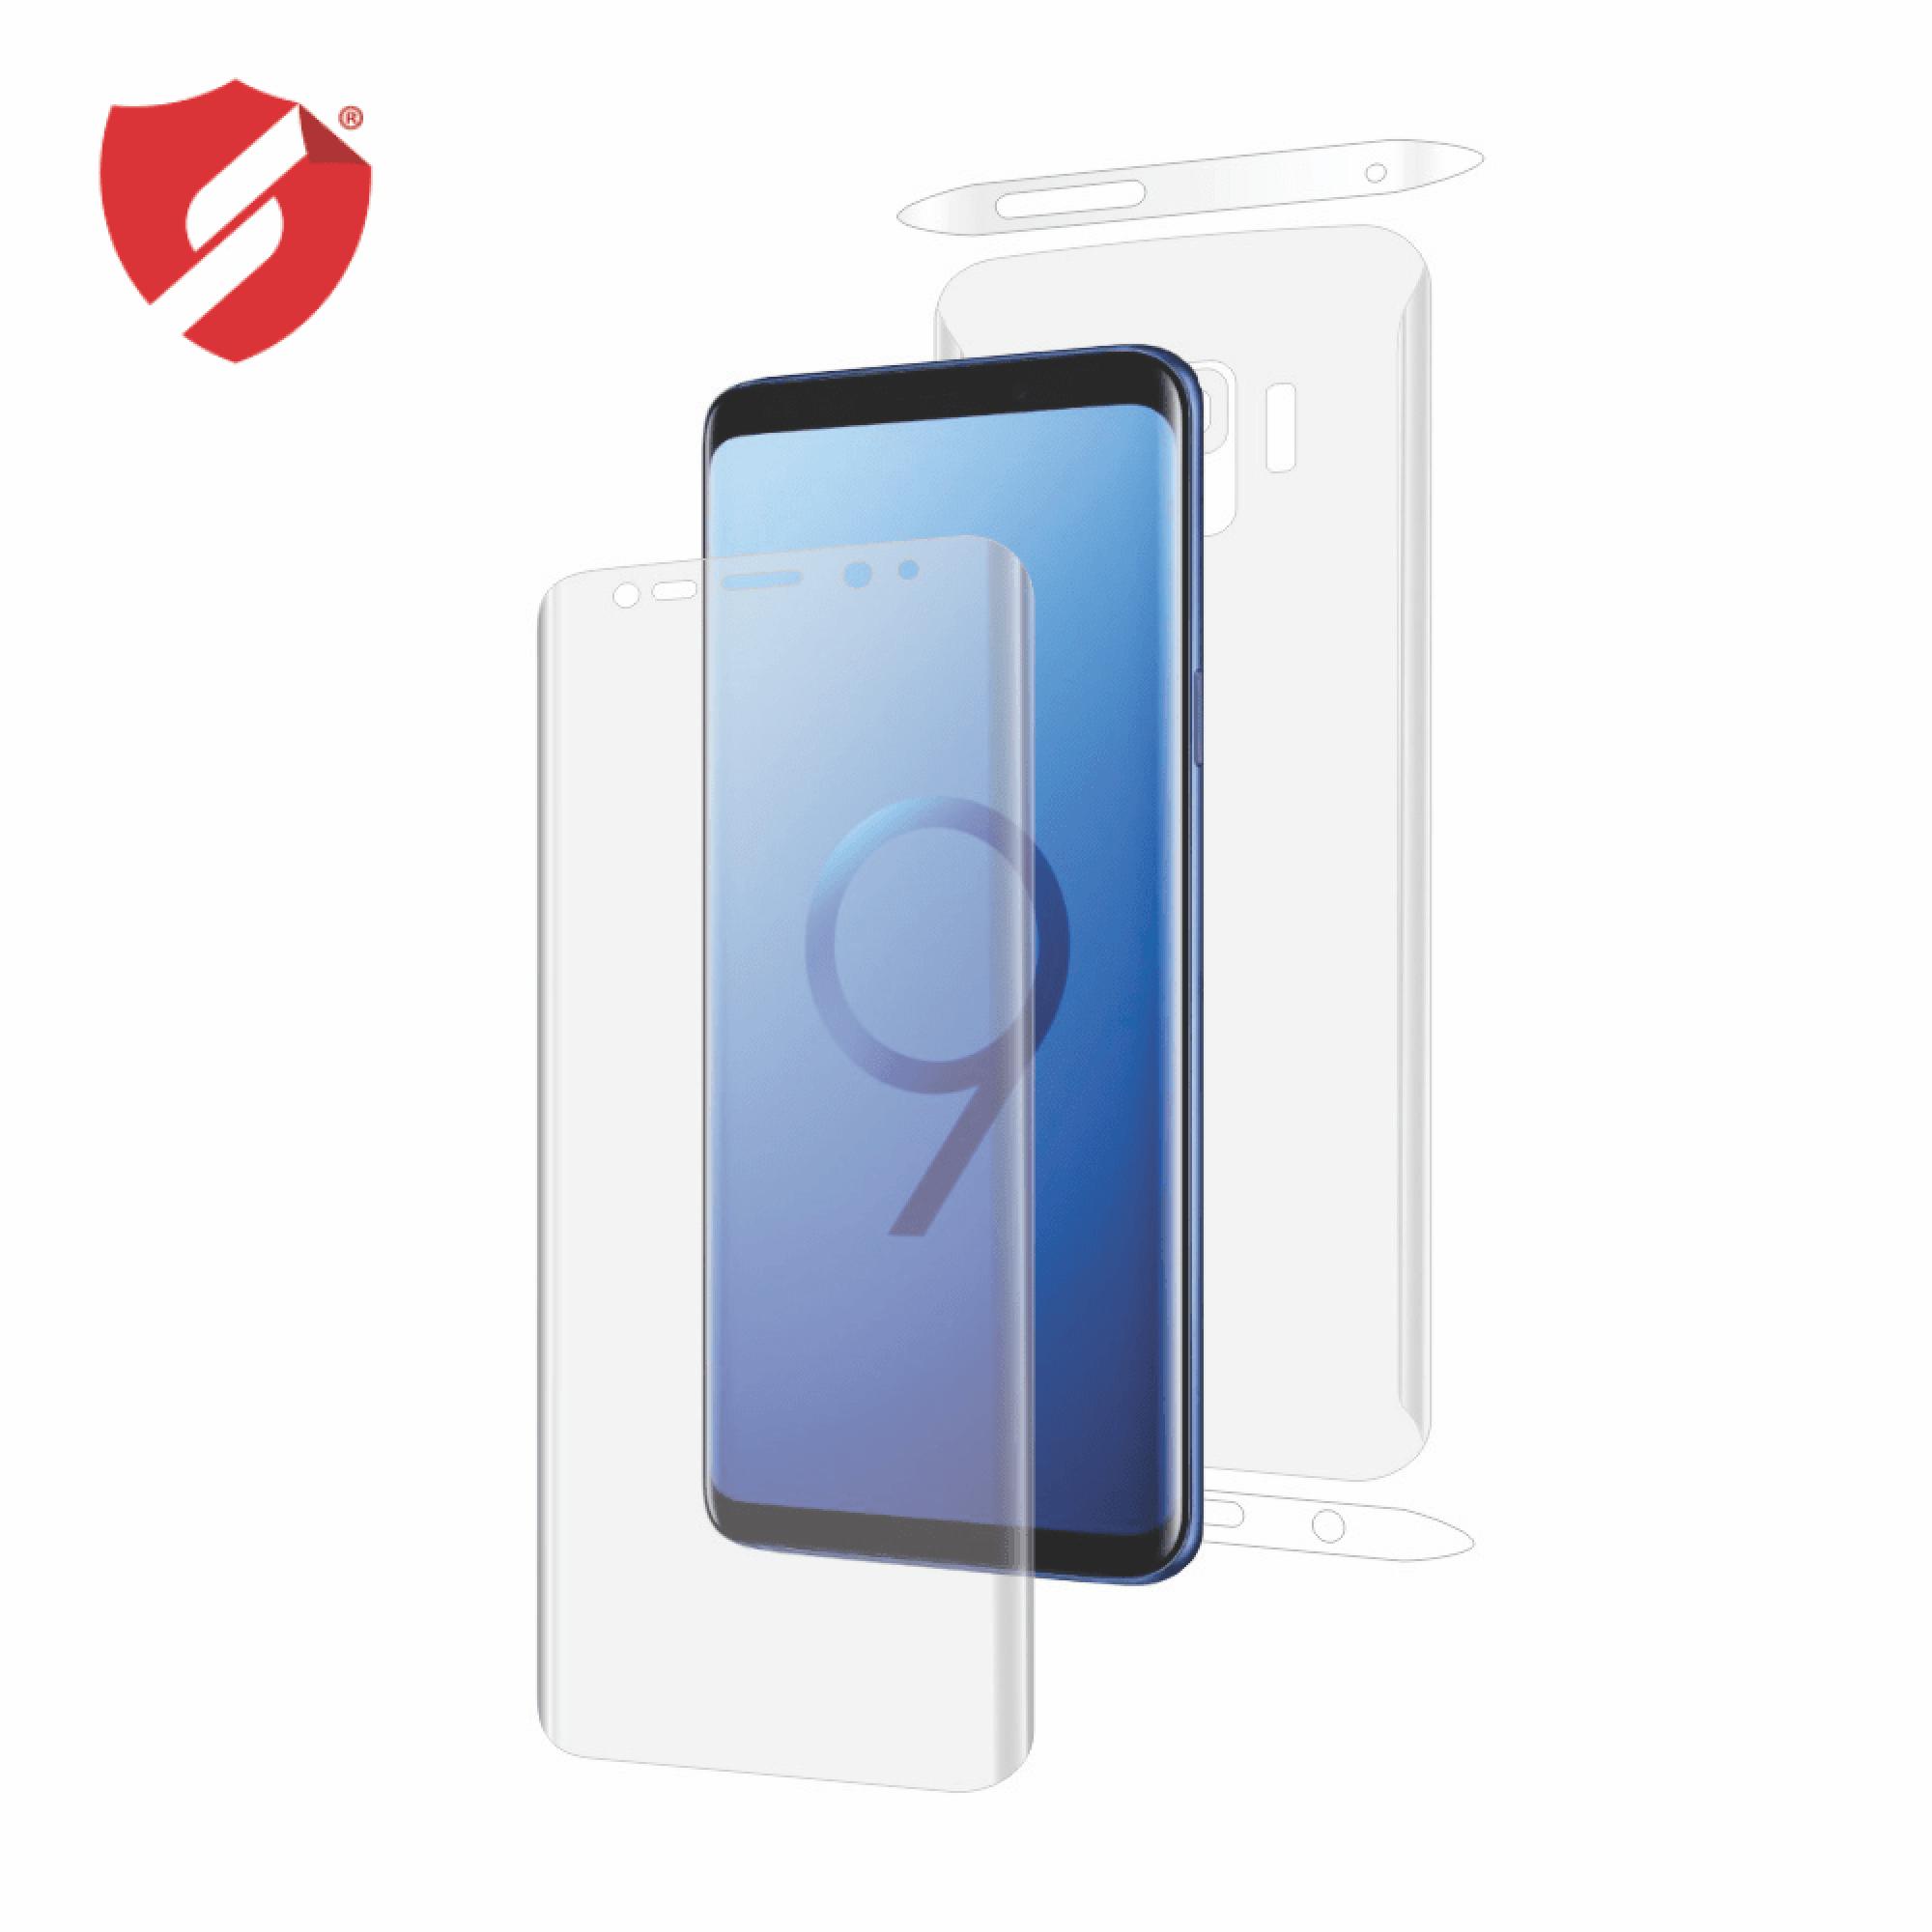 Folie de protectie Smart Protection Samsung Galaxy S9 compatibila cu carcasa Spigen Thin Fit - fullbody - display + spate + laterale imagine